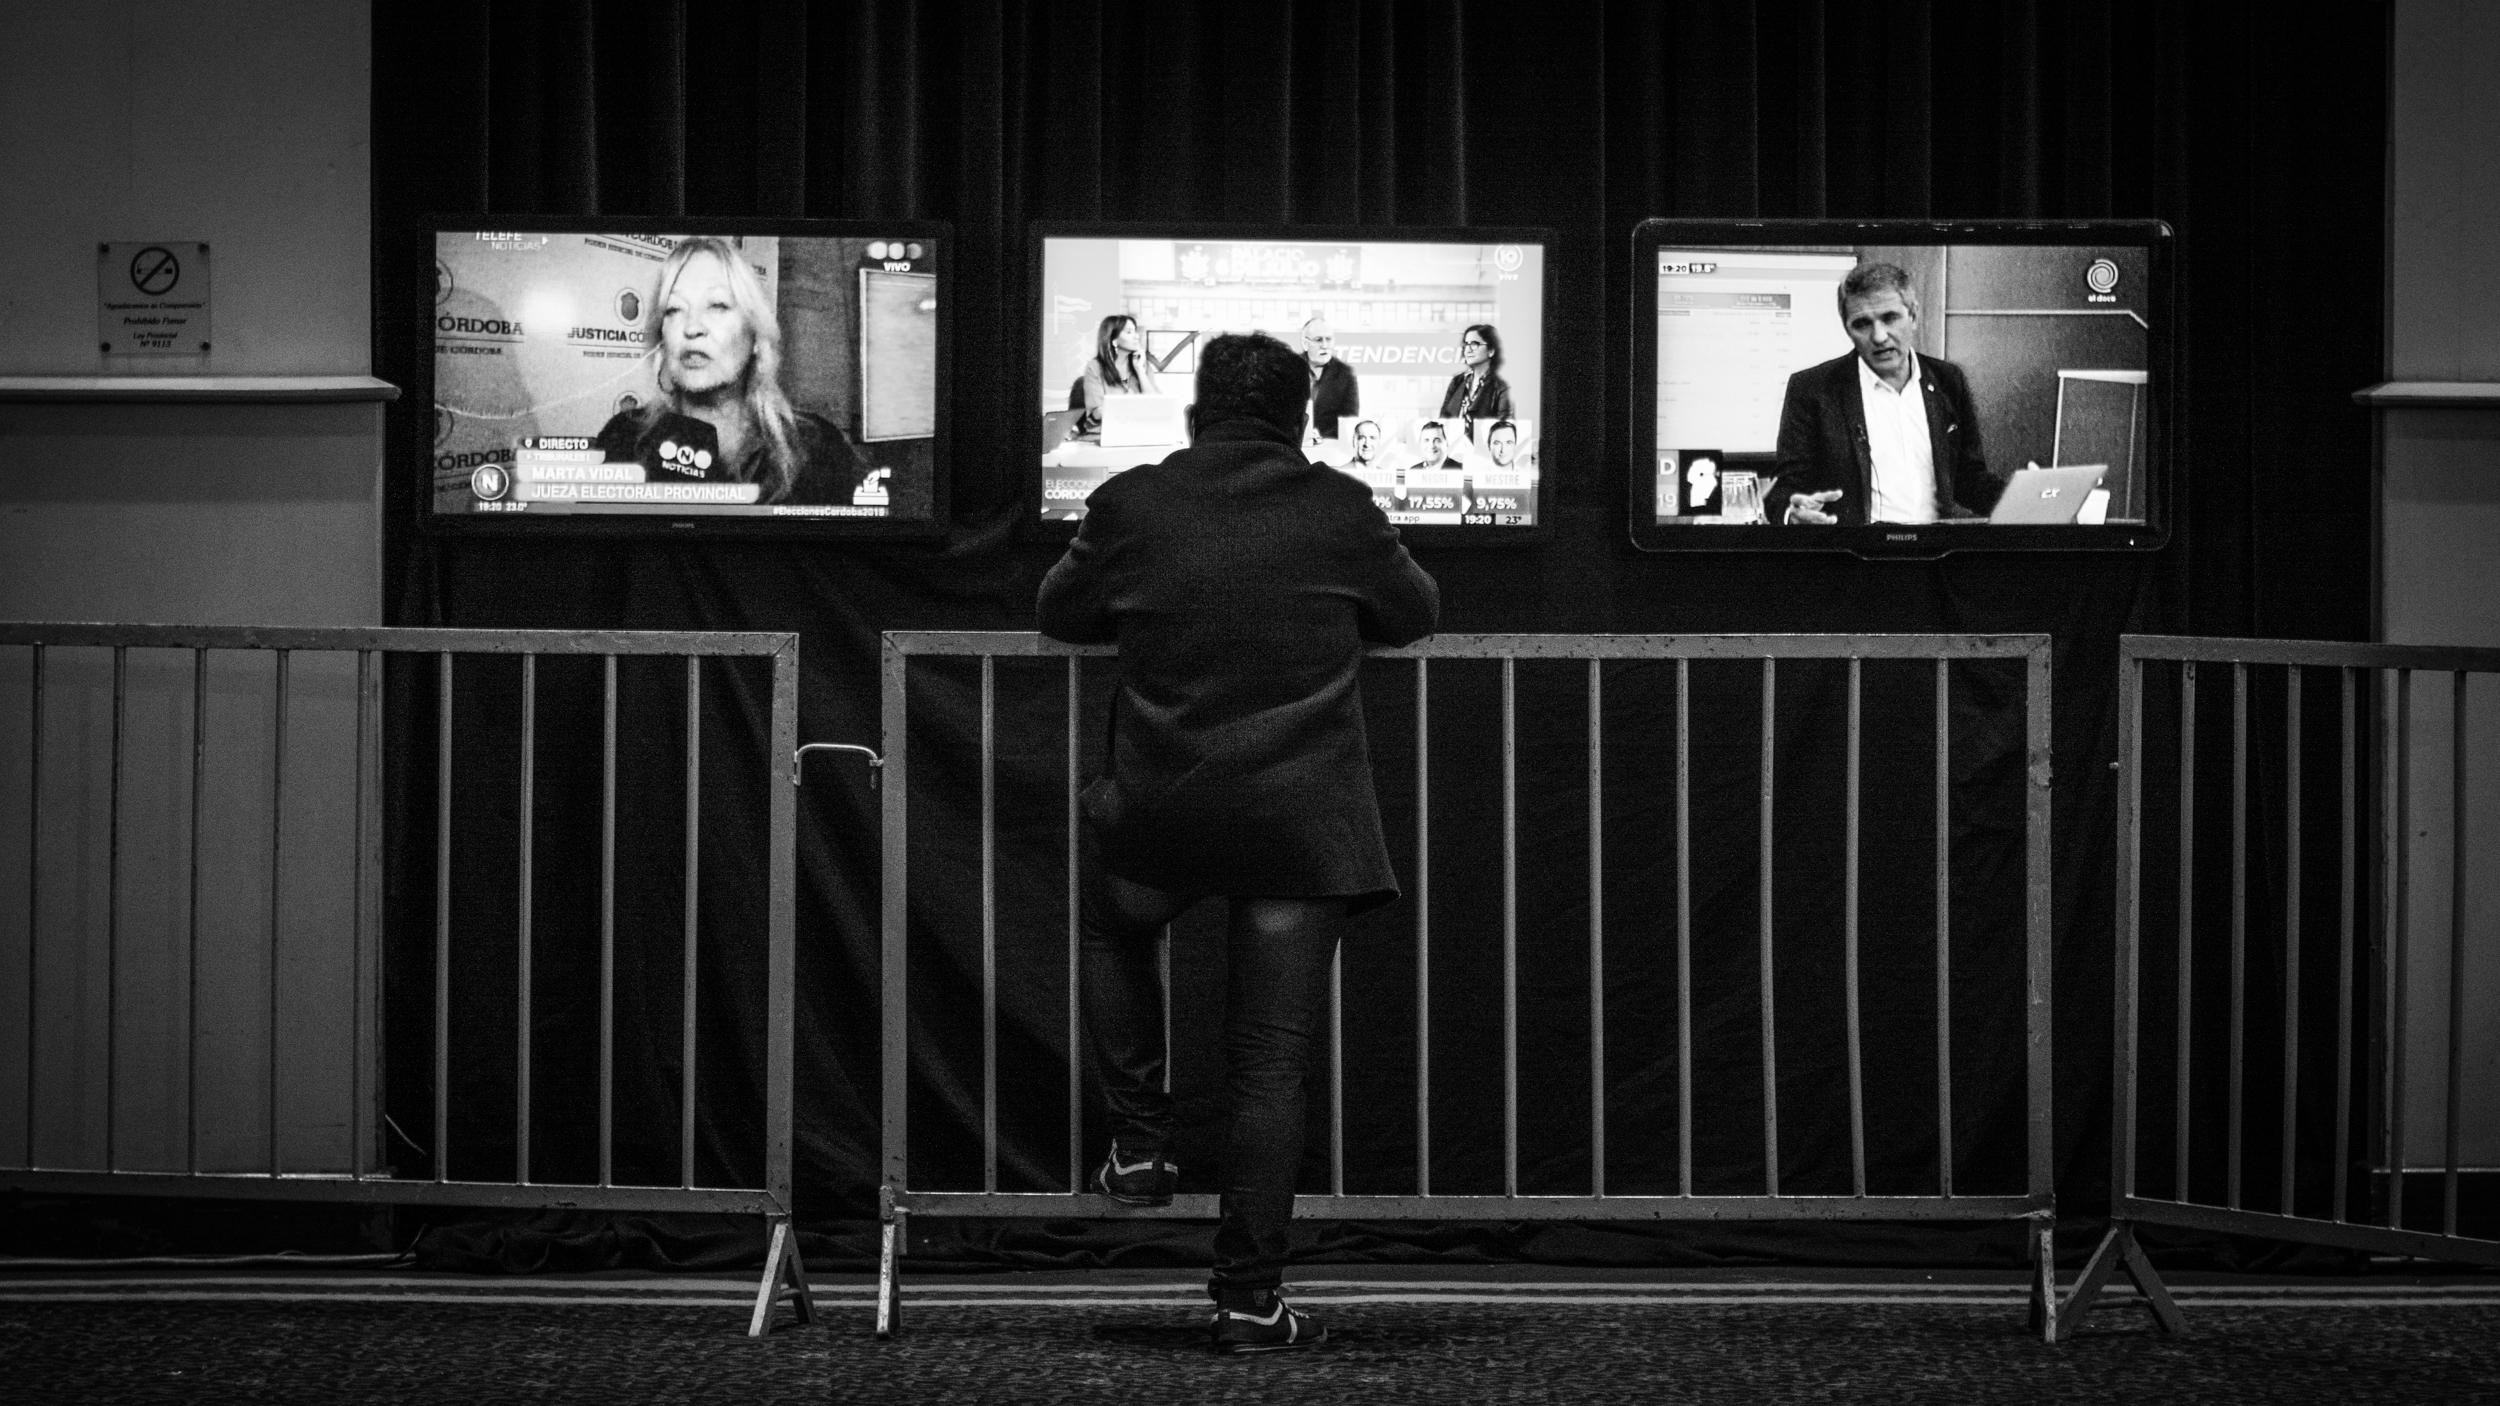 elecciones-córdoba-2019-bunker (1)